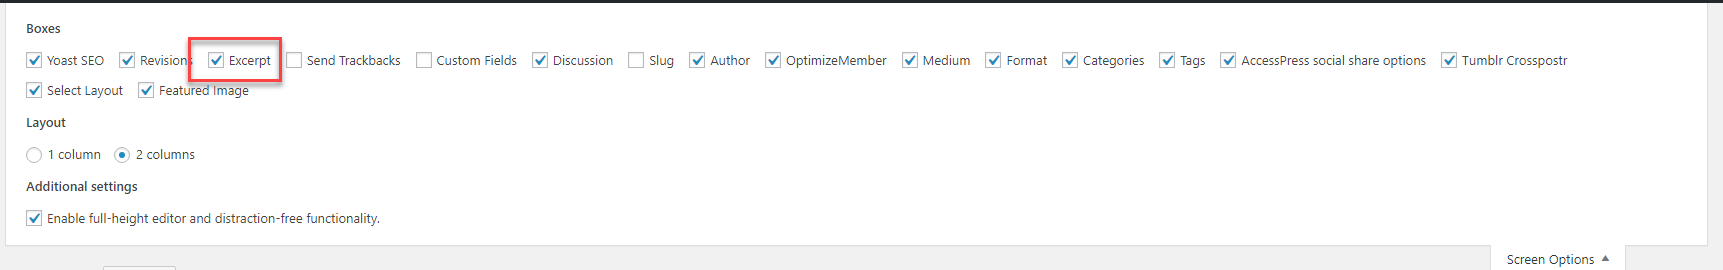 Screen options in WordPress